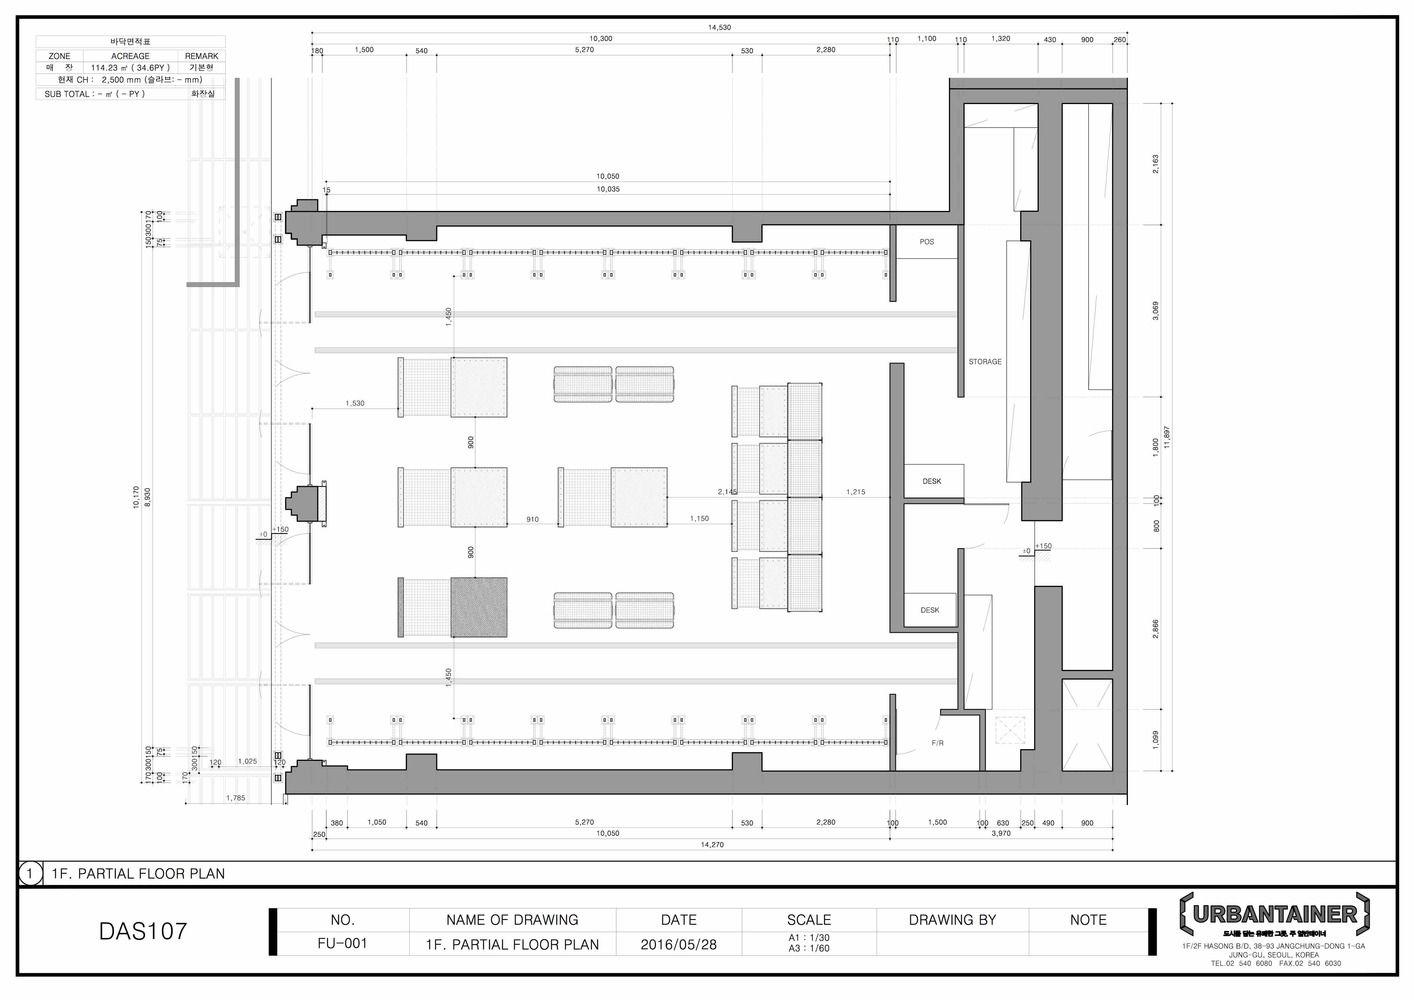 Adidas Concept Store Das 107 By Kasina Urbantainer Concept Store Store Design Interior Store Plan